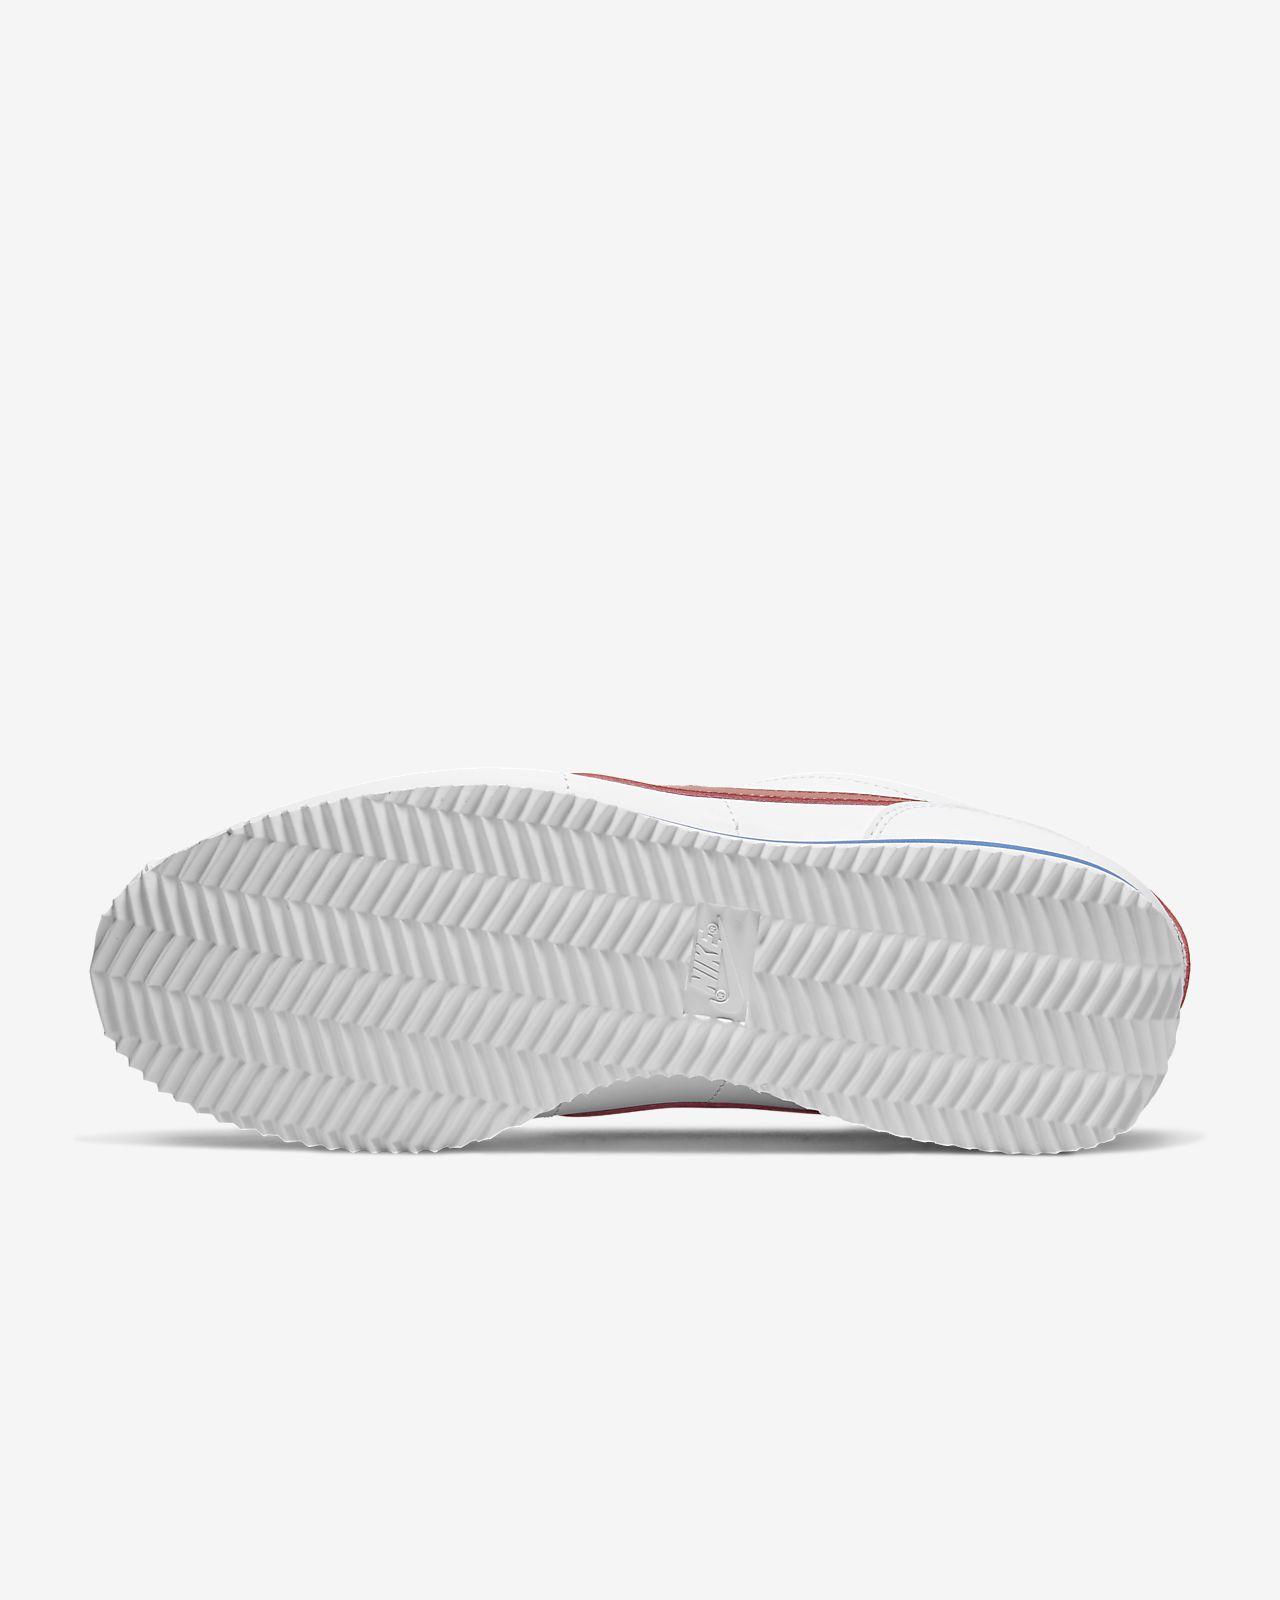 chaussure nike basique